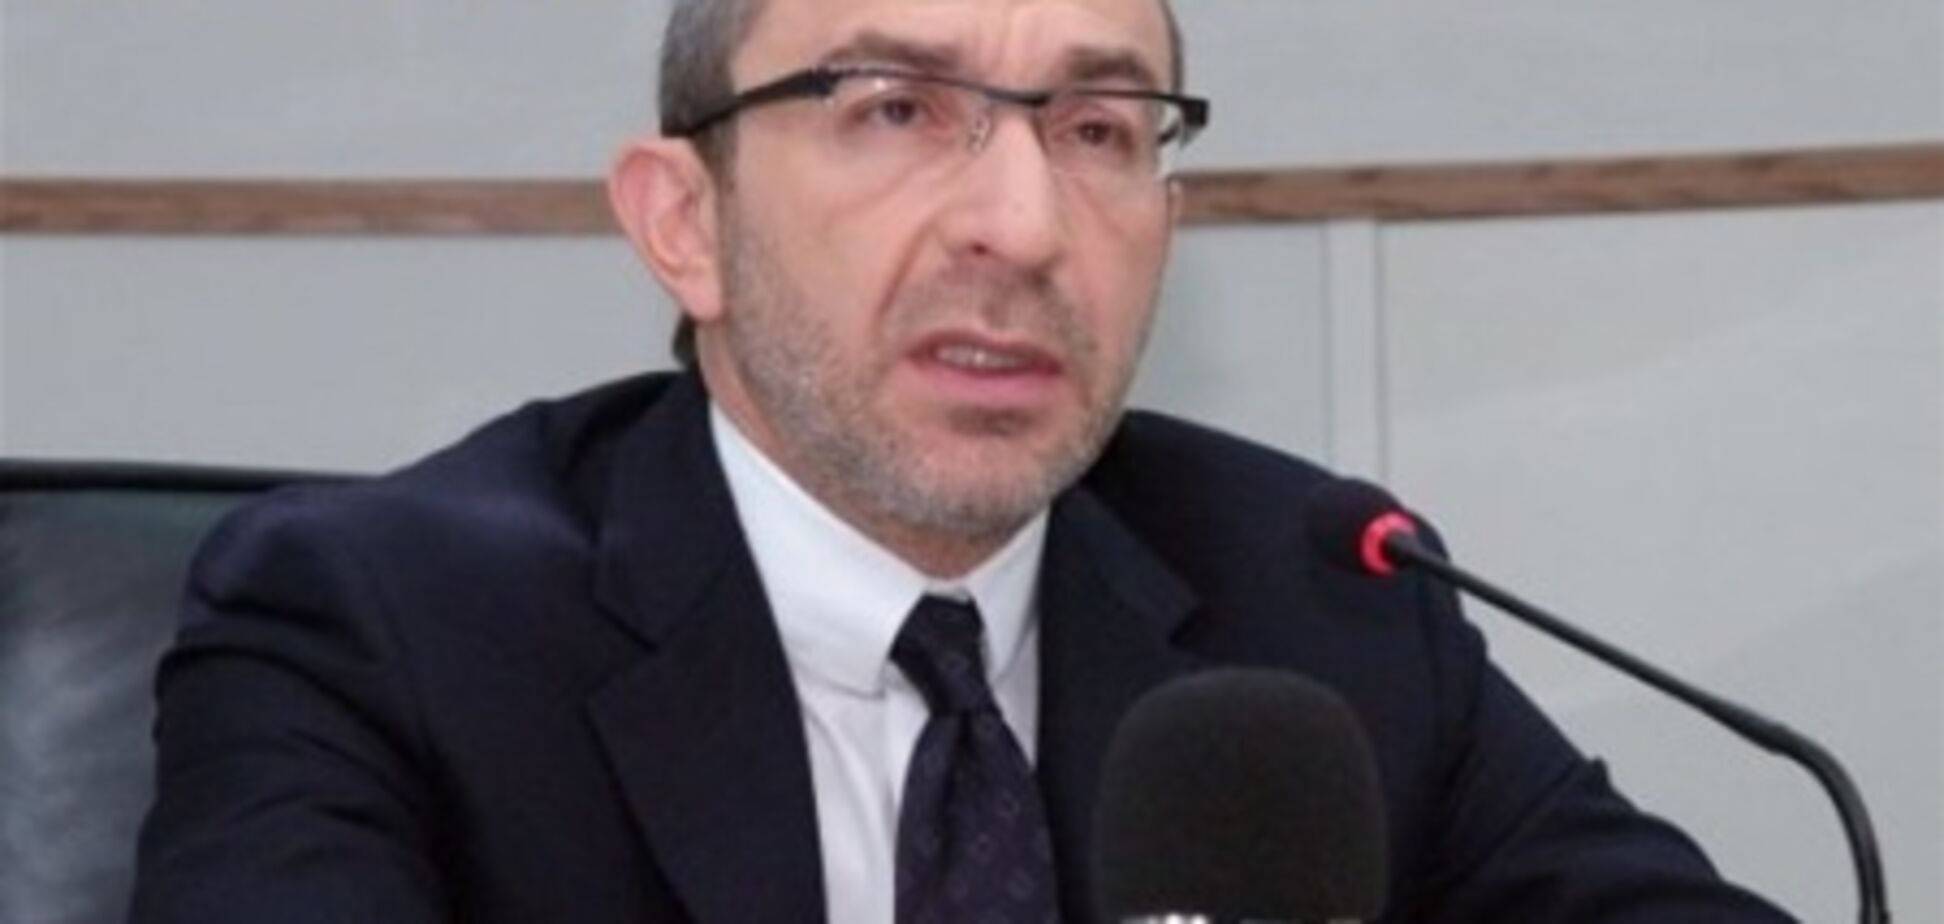 Мэр Харькова назвал чиновника 'сучим псом' из-за халатности